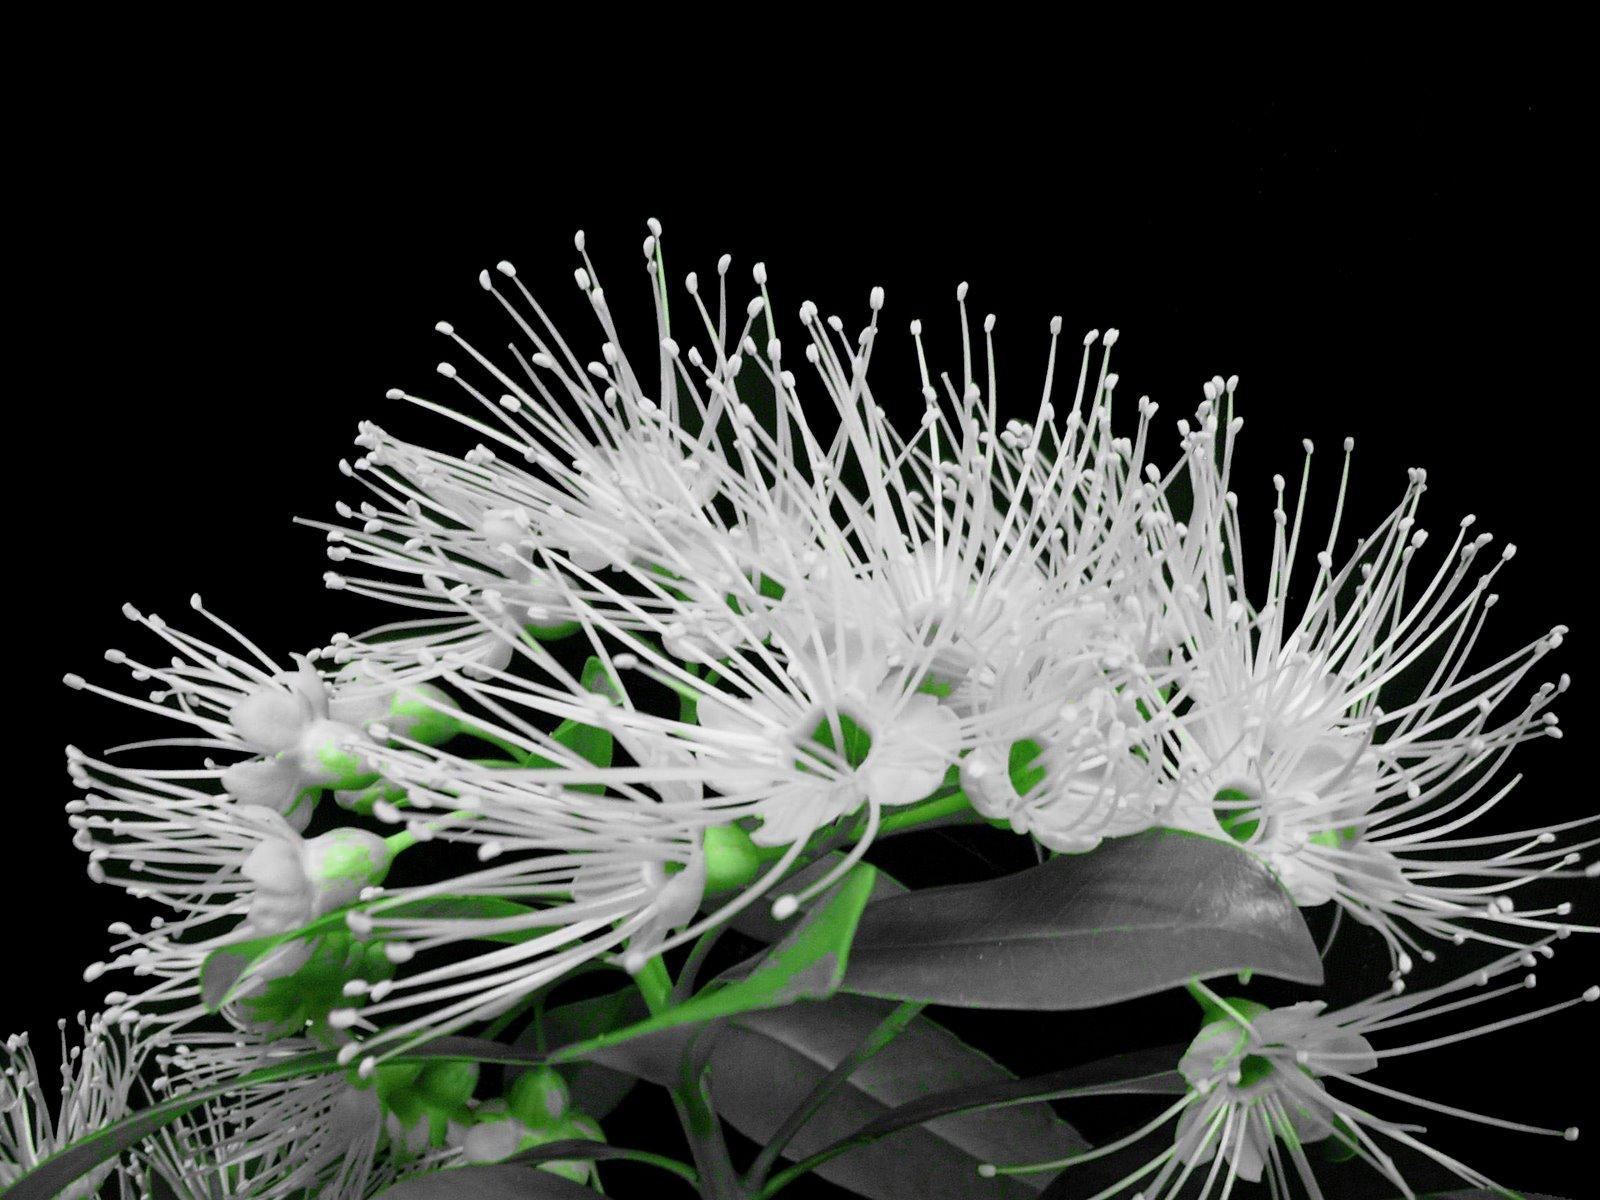 http://4.bp.blogspot.com/_DoHR7WYShjg/SawIS_mejGI/AAAAAAAAAUc/hoyuspb7FOg/s1600/Spiky+flower+169.jpg